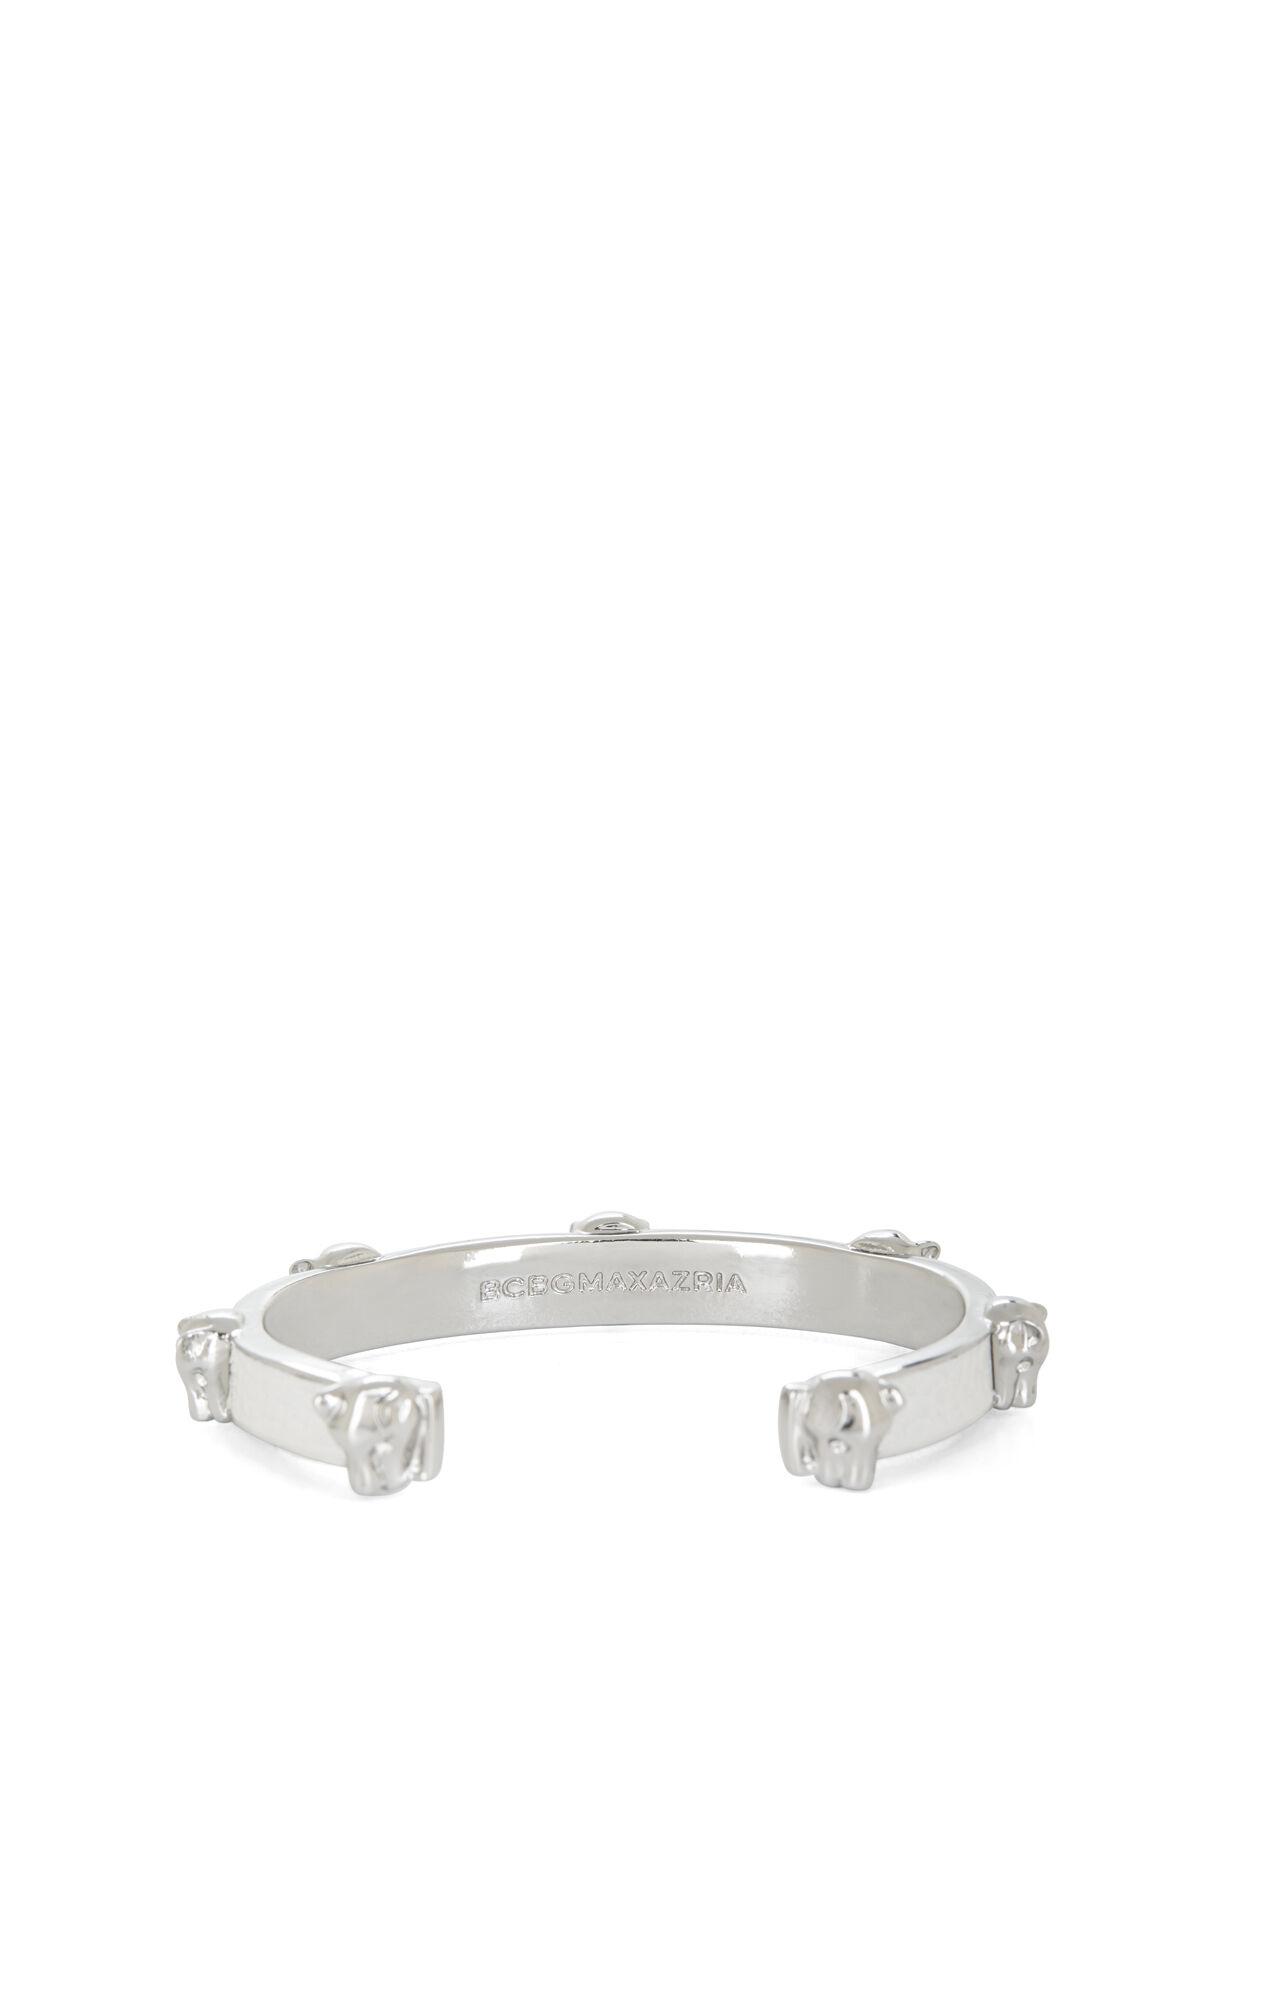 Panther-Inlay Cuff Bracelet